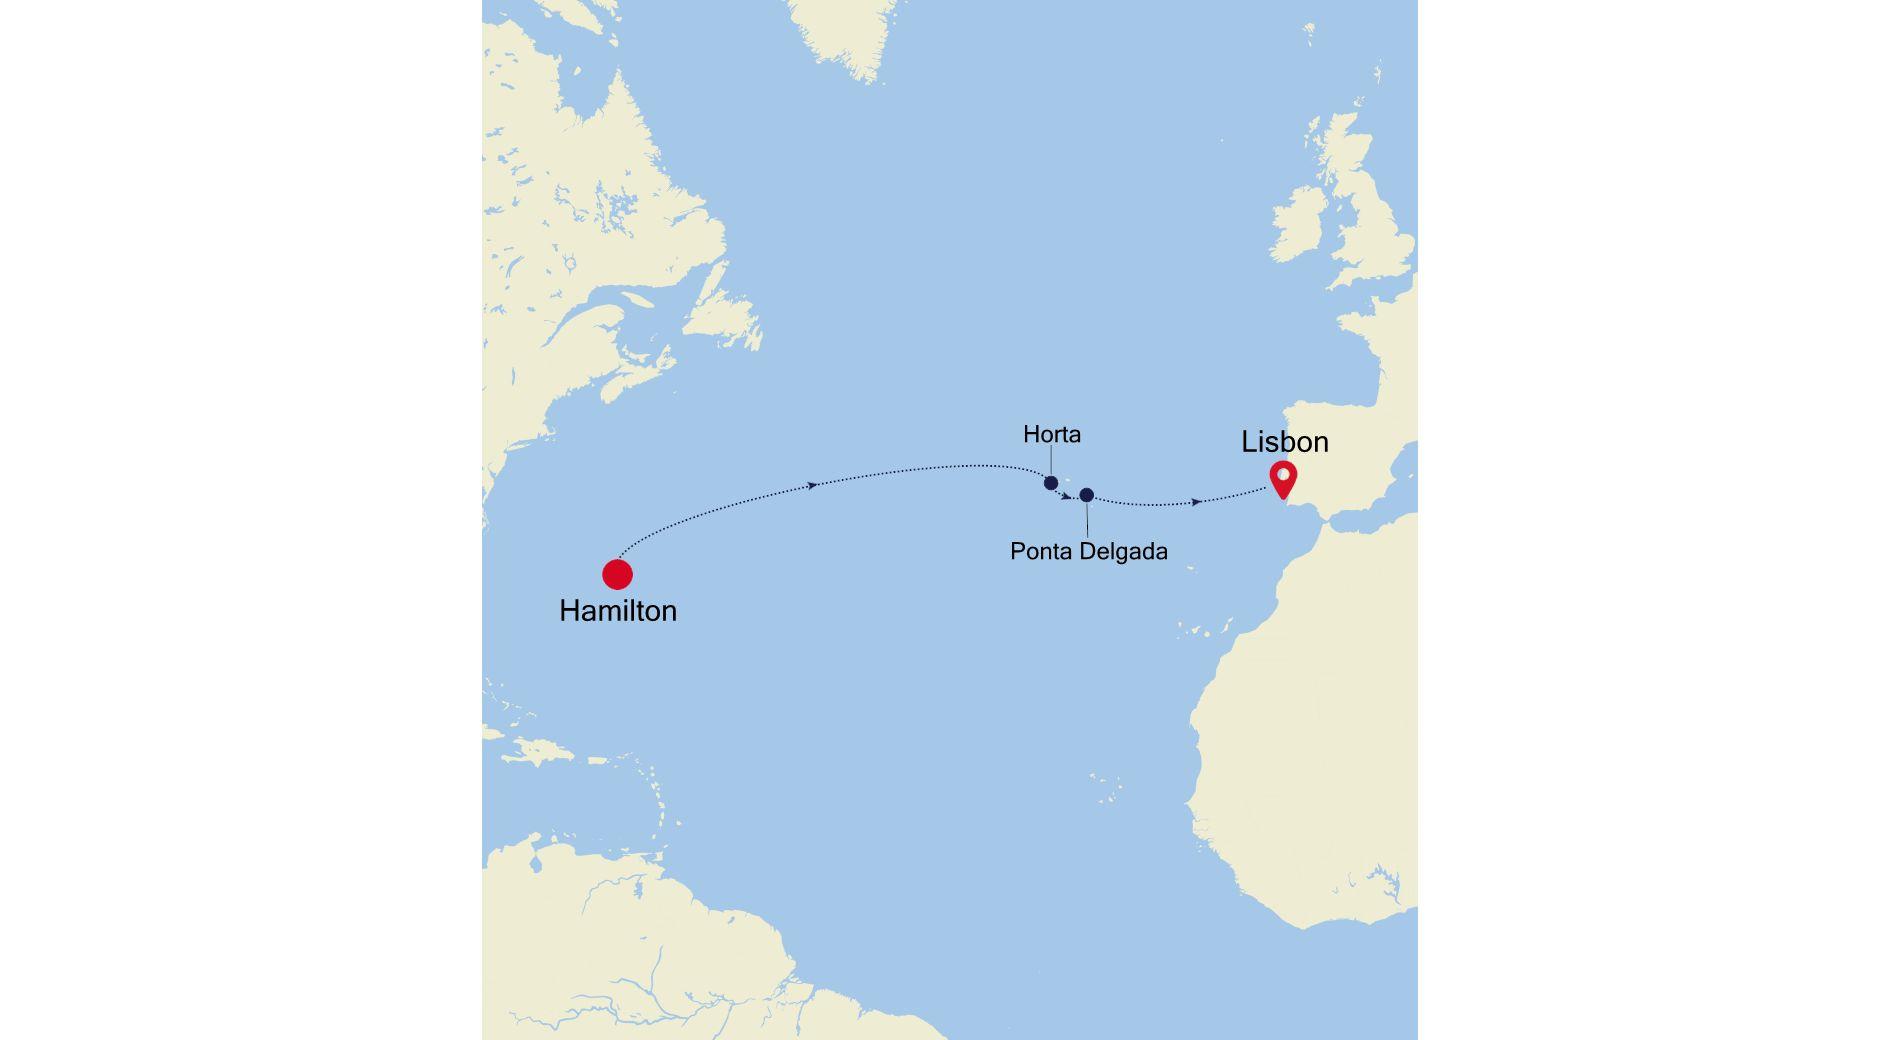 SS210418S10 - Hamilton a Lisbon